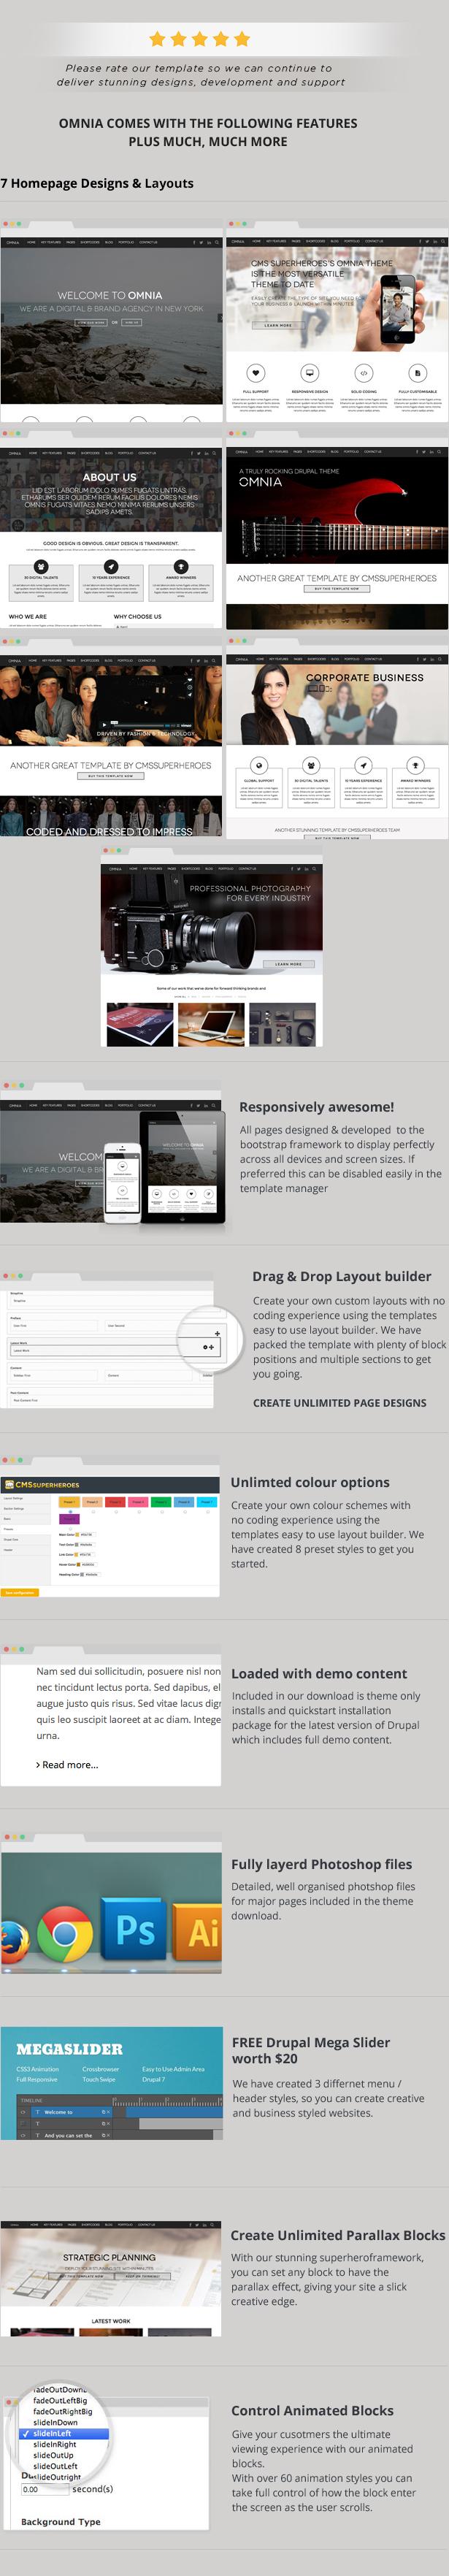 Omnia - Multi Purpose Agency Drupal Theme